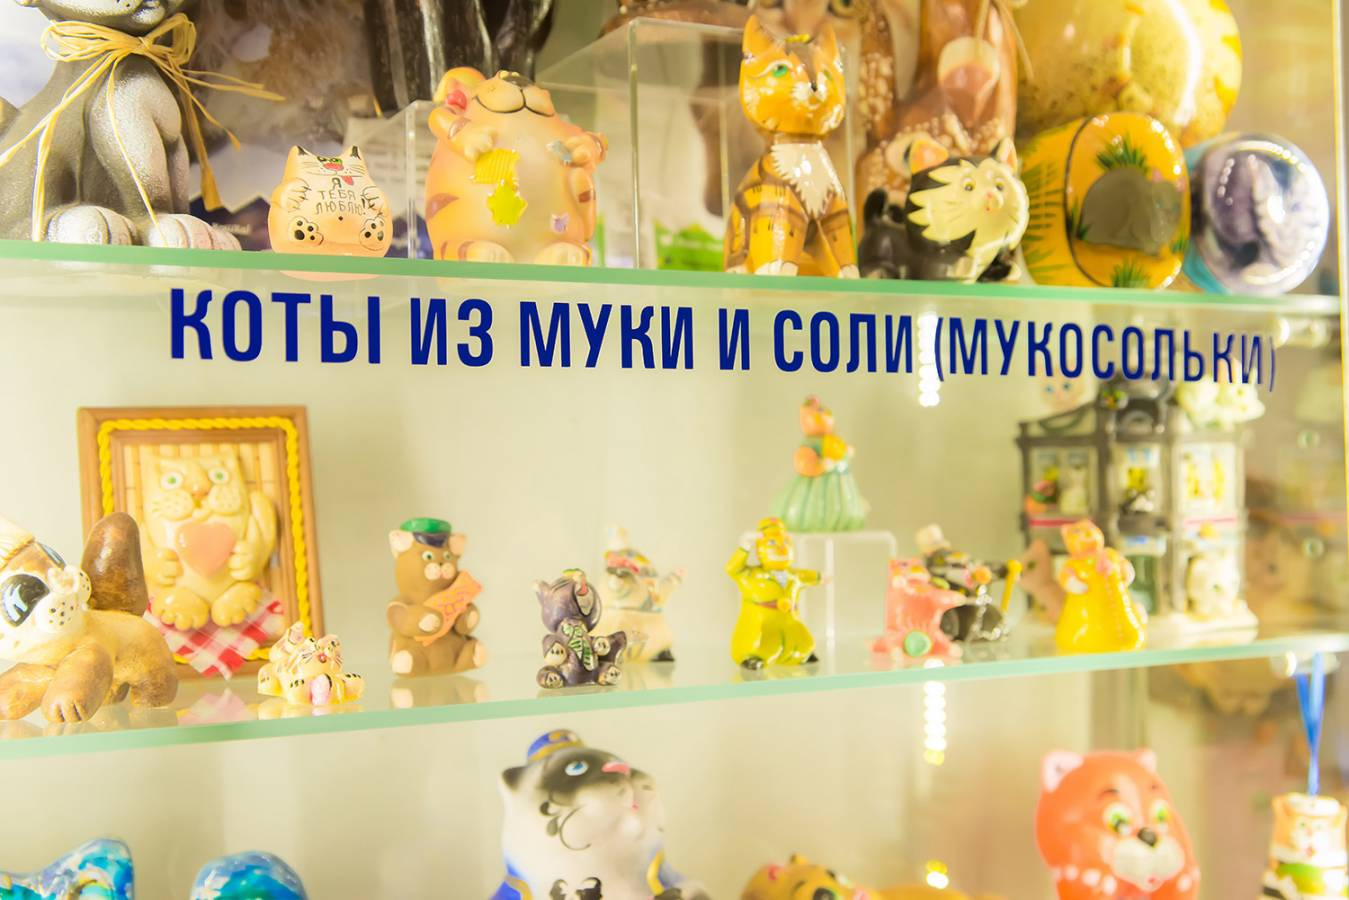 <p>Мурариум. Музей кошек. Зеленоградск</p>/<p>Мурариум</p>